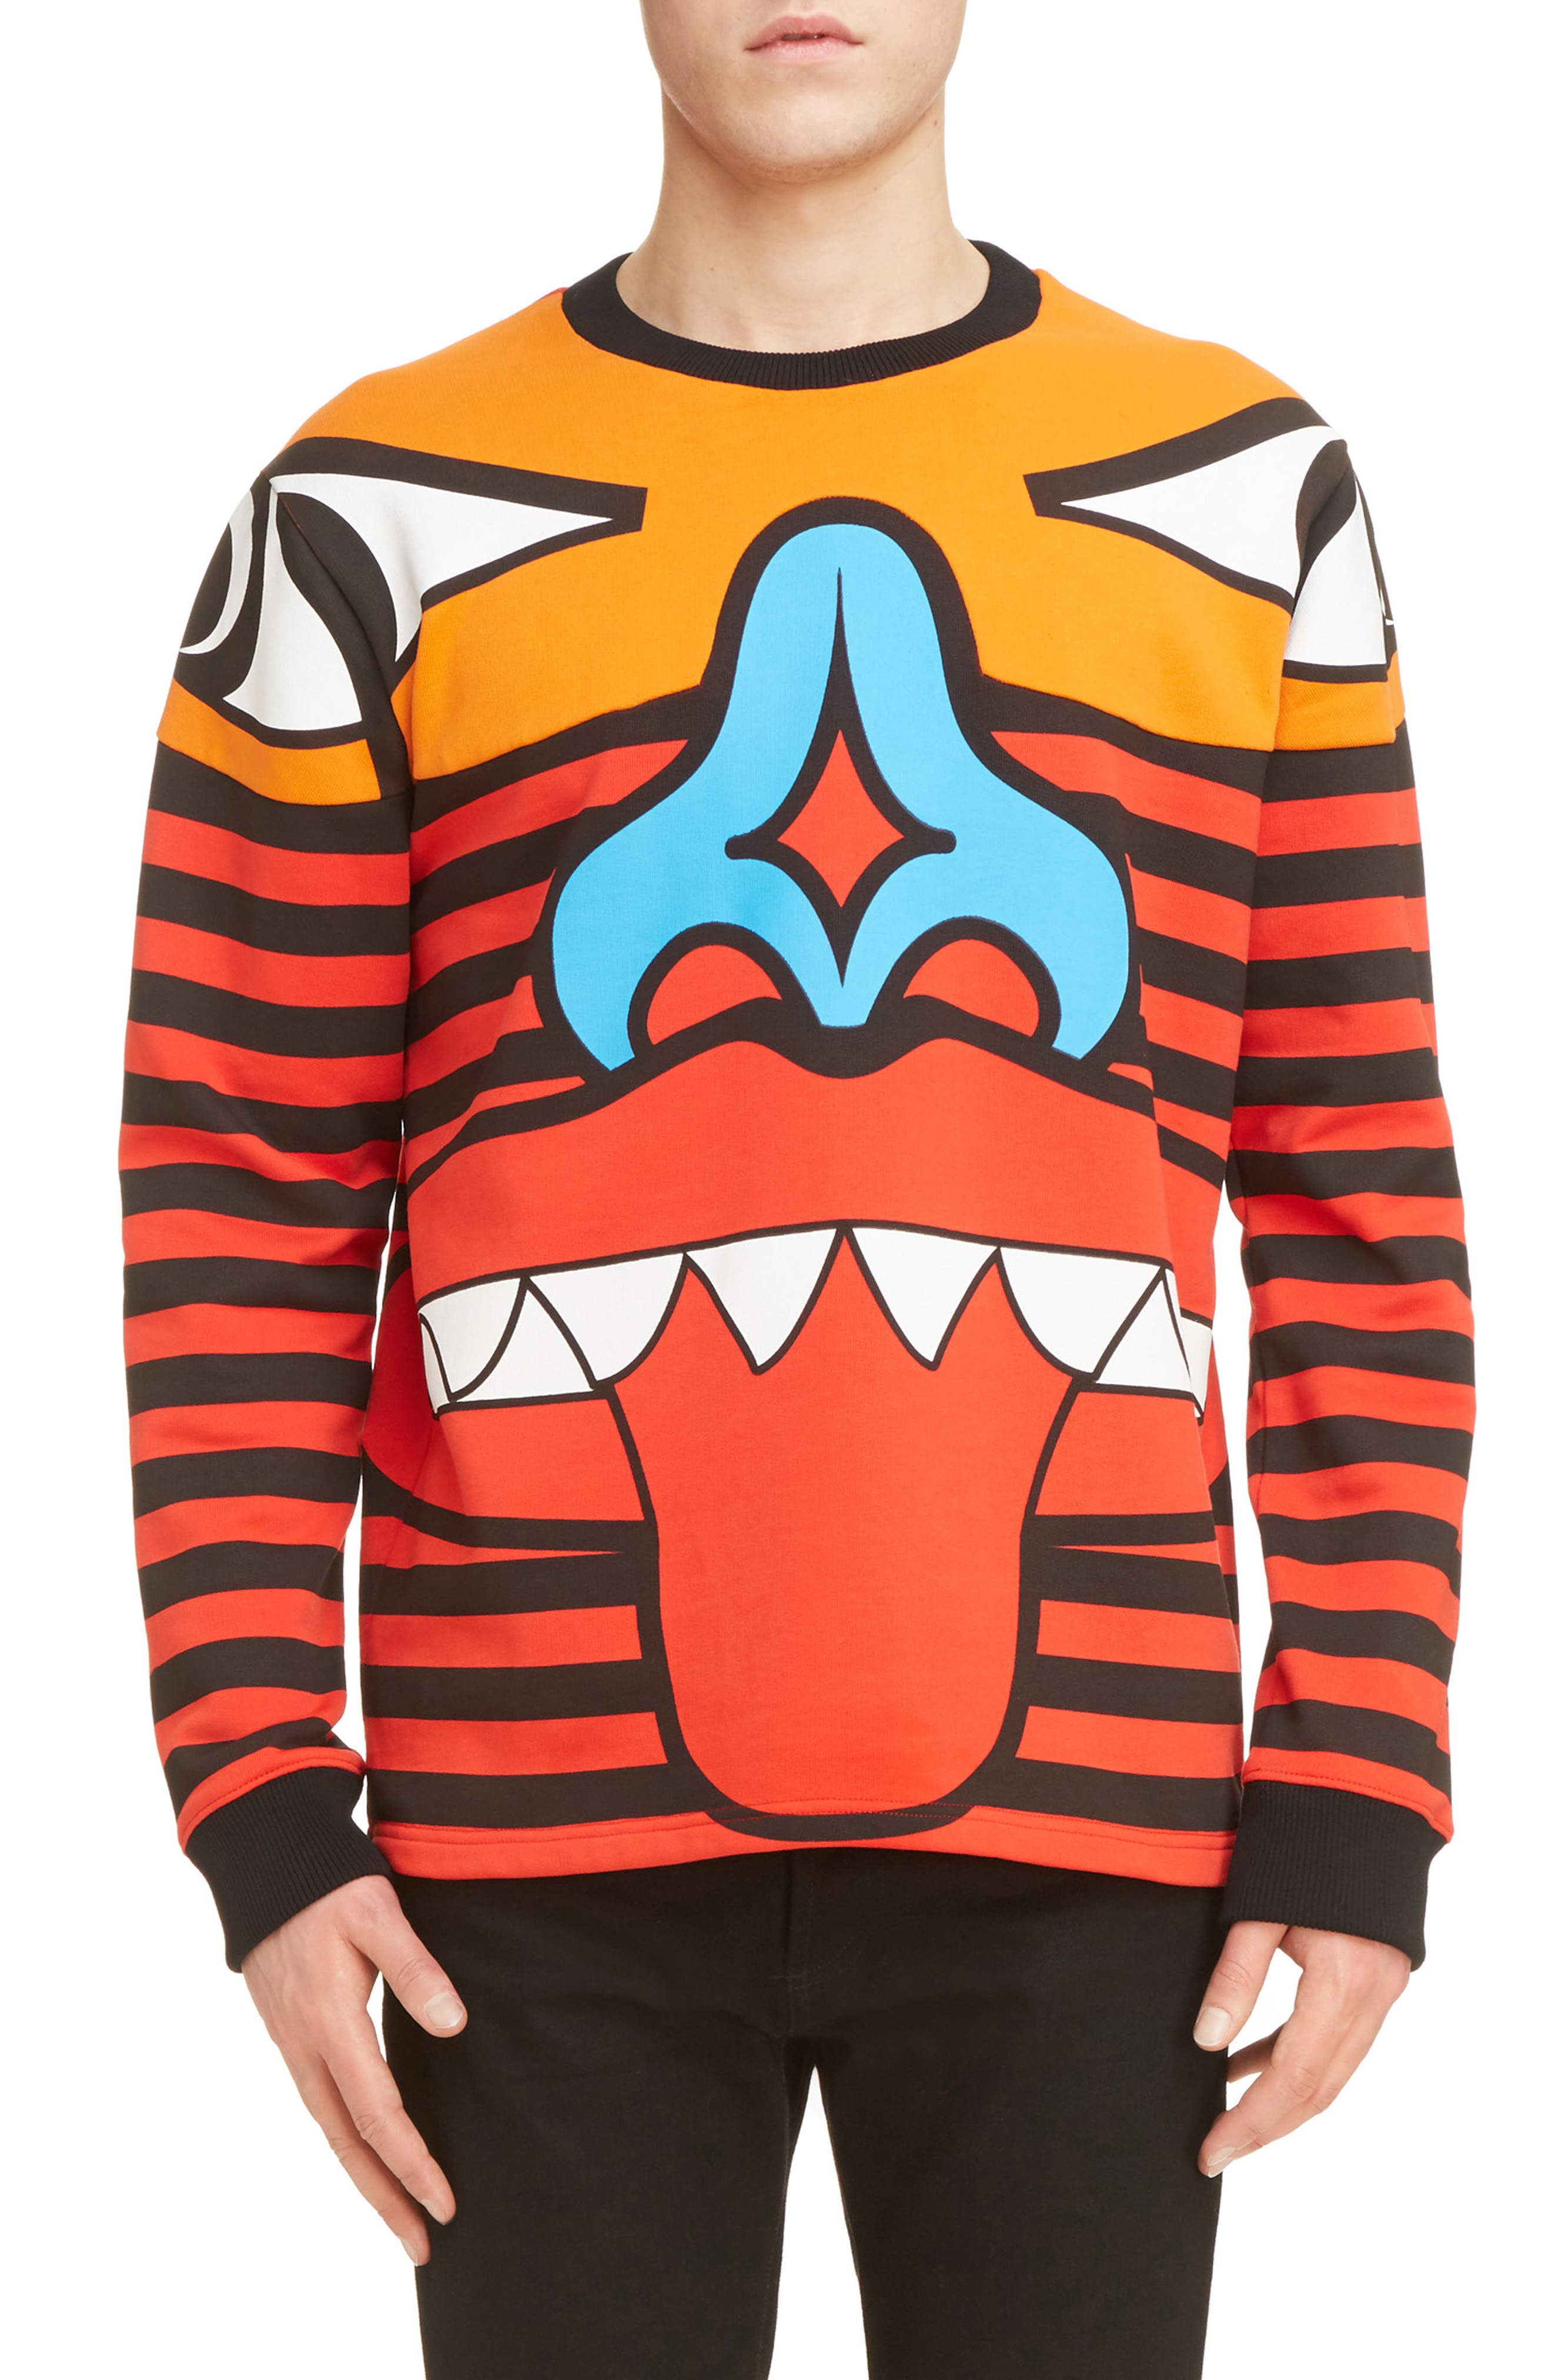 Alternate Image 1 Selected - Givenchy Runway Totem Sweatshirt